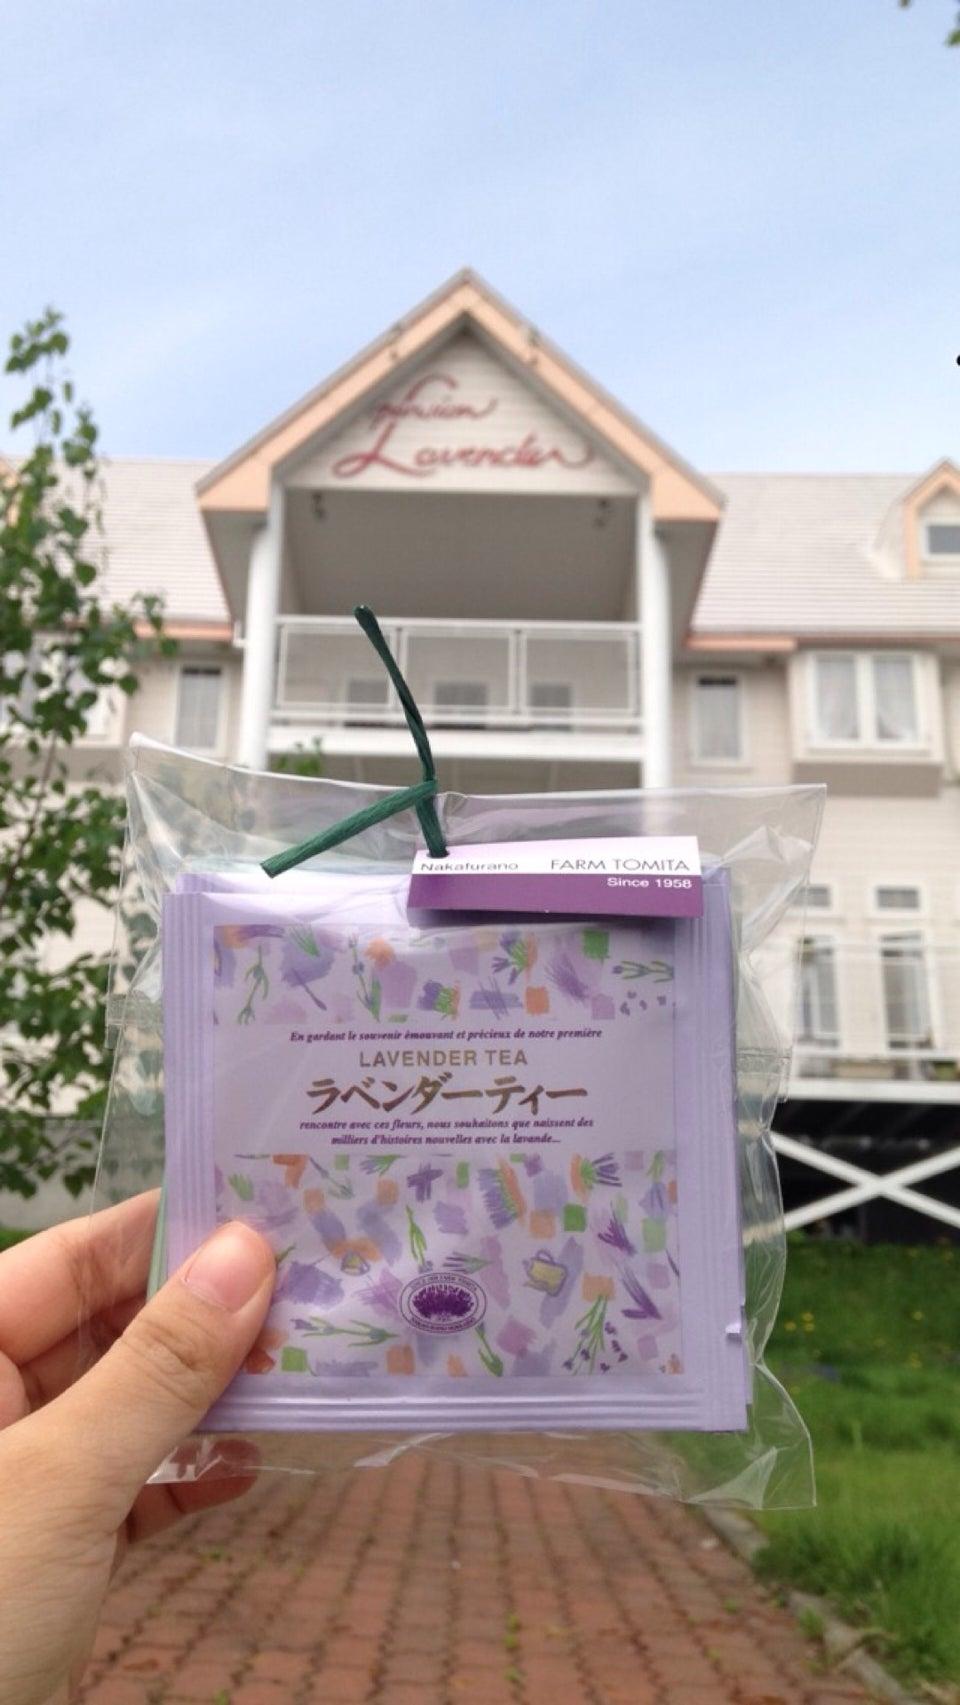 Pension Lavender